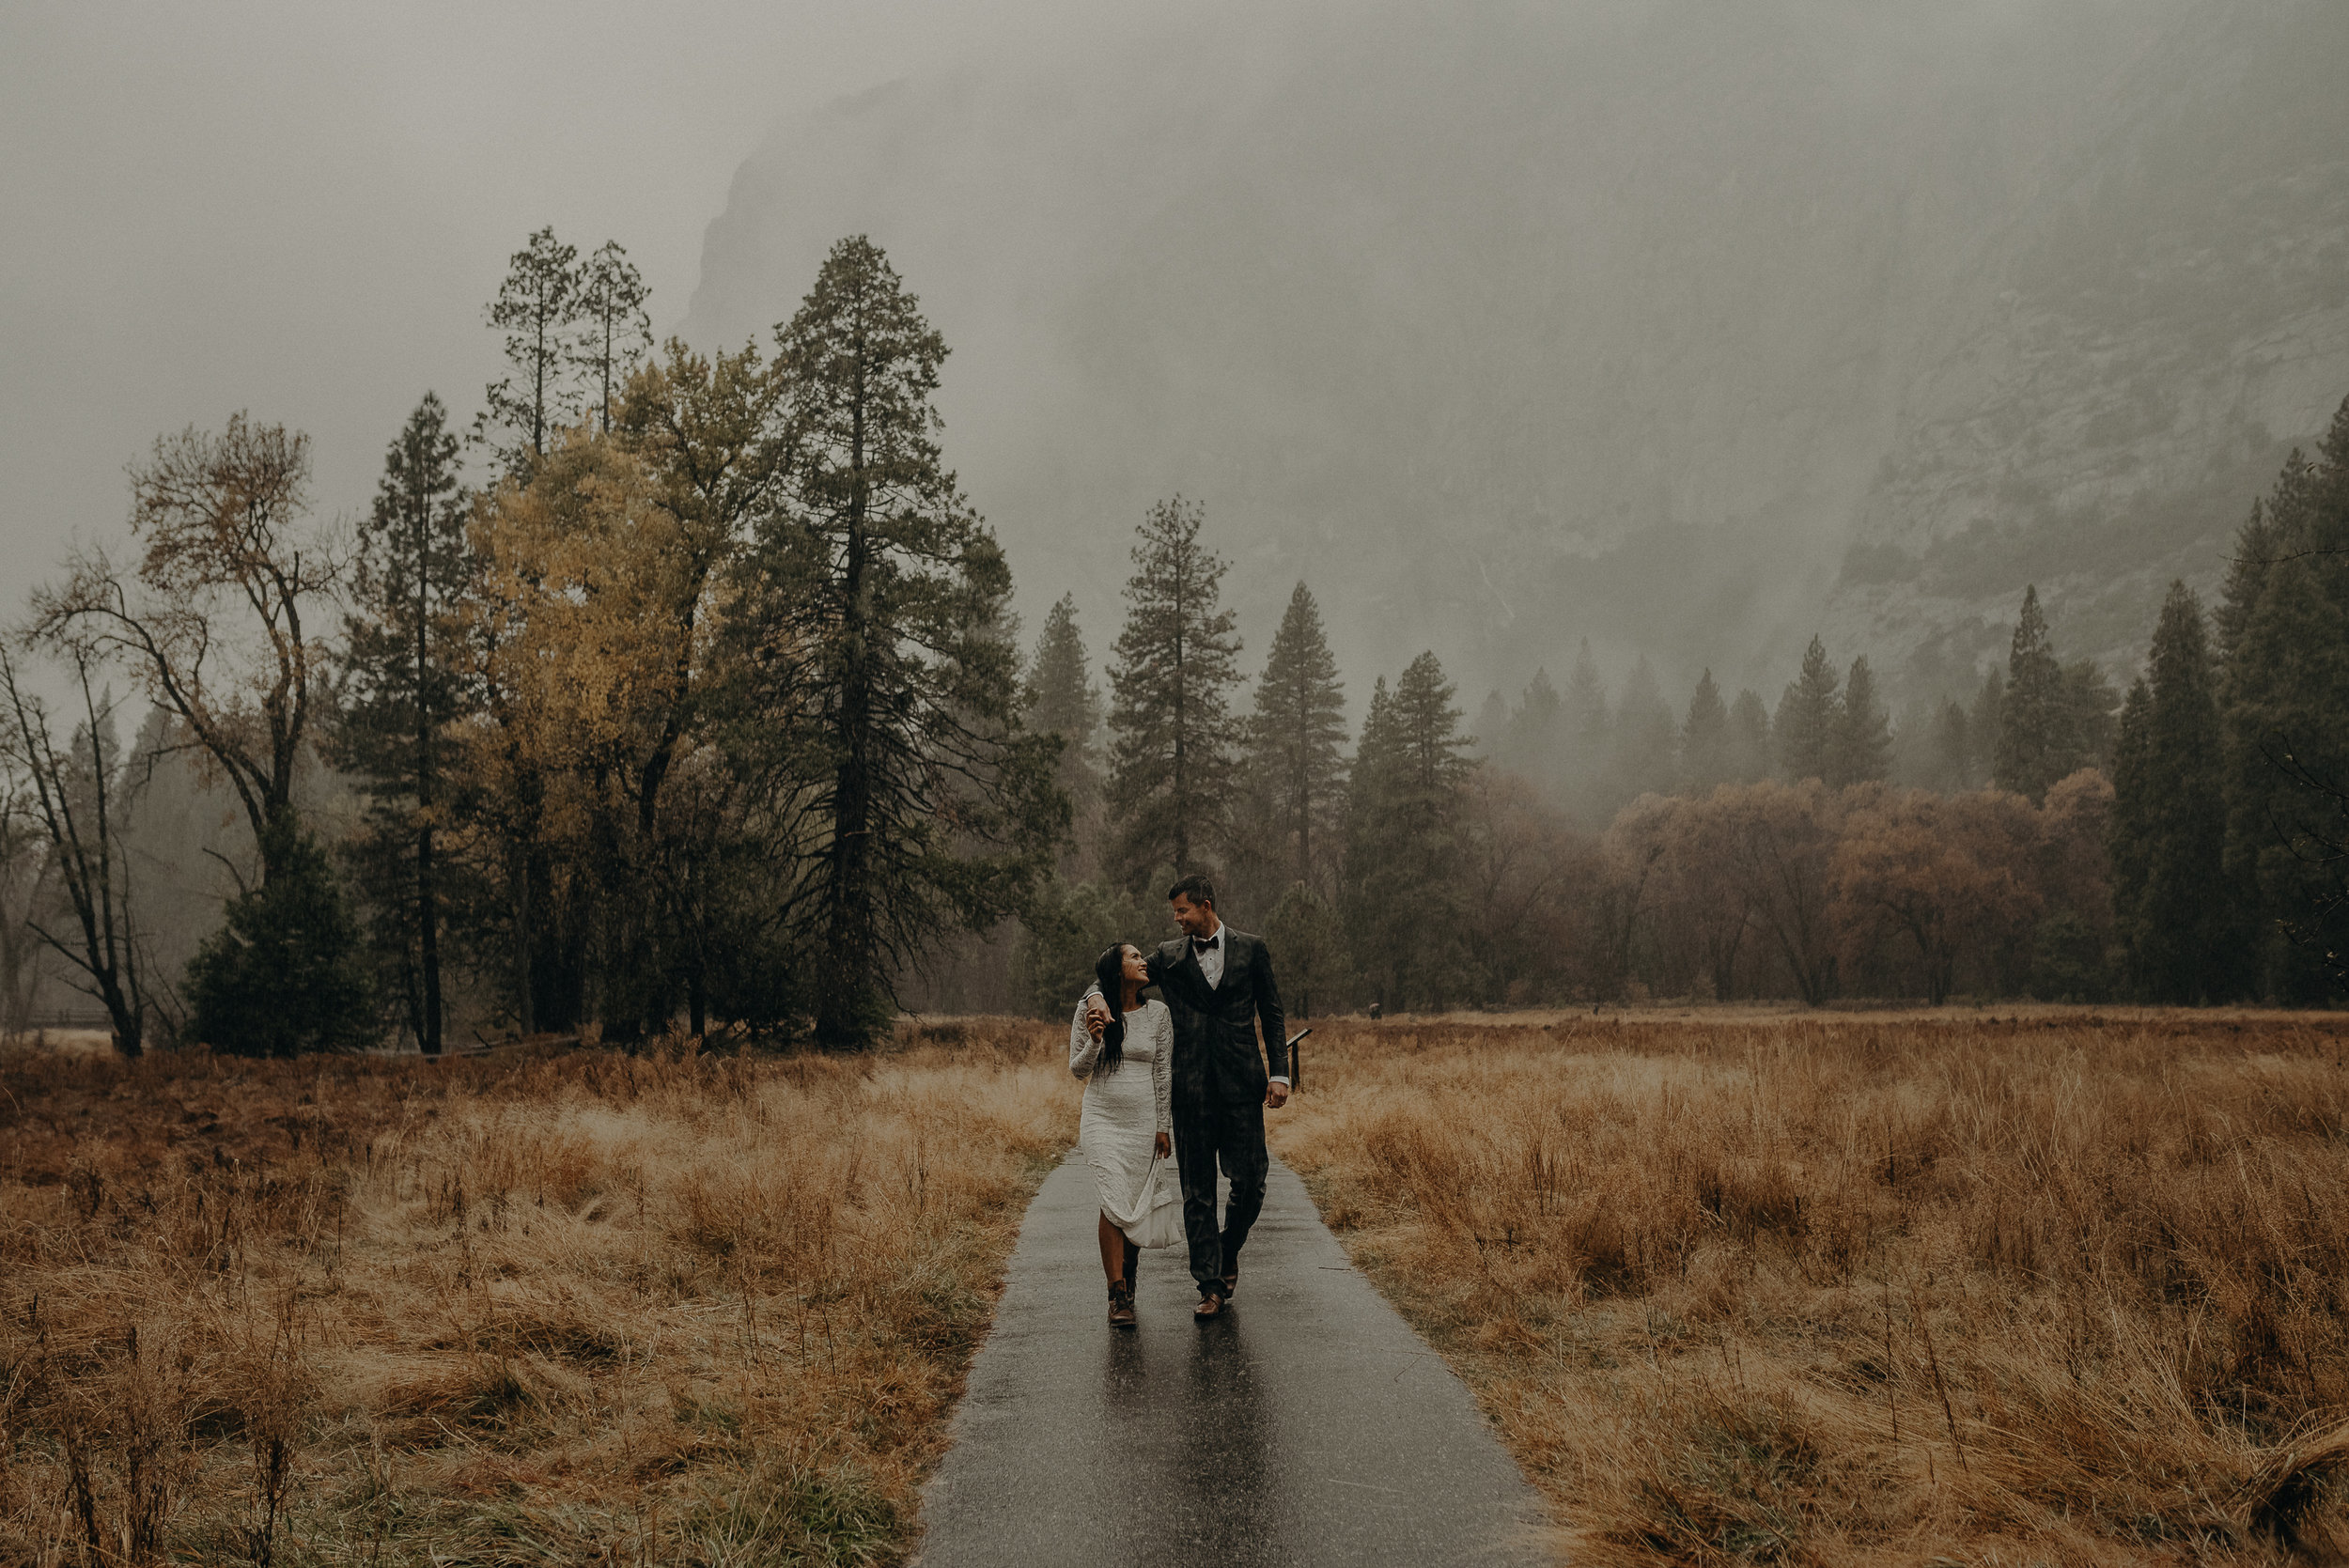 Isaiah + Taylor Photography - Yosemite Elopement - Los Angeles Wedding Photographer-75.jpg